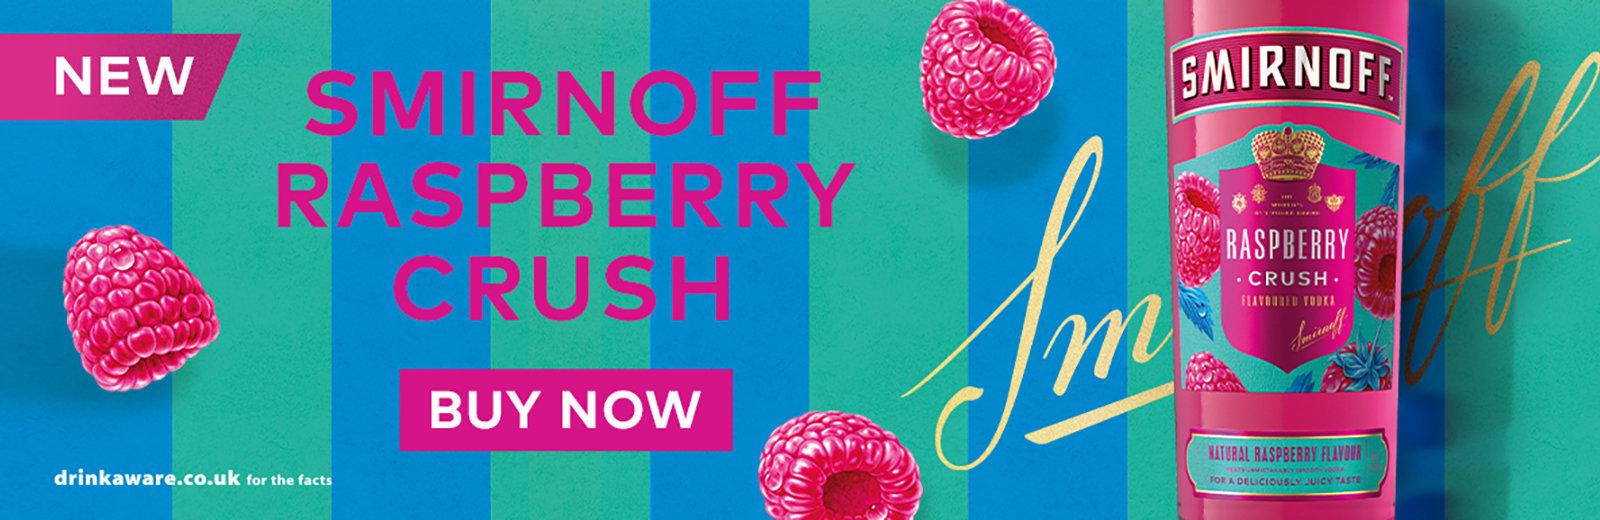 Smirnoff Raspberry Crush_1600x520pixels